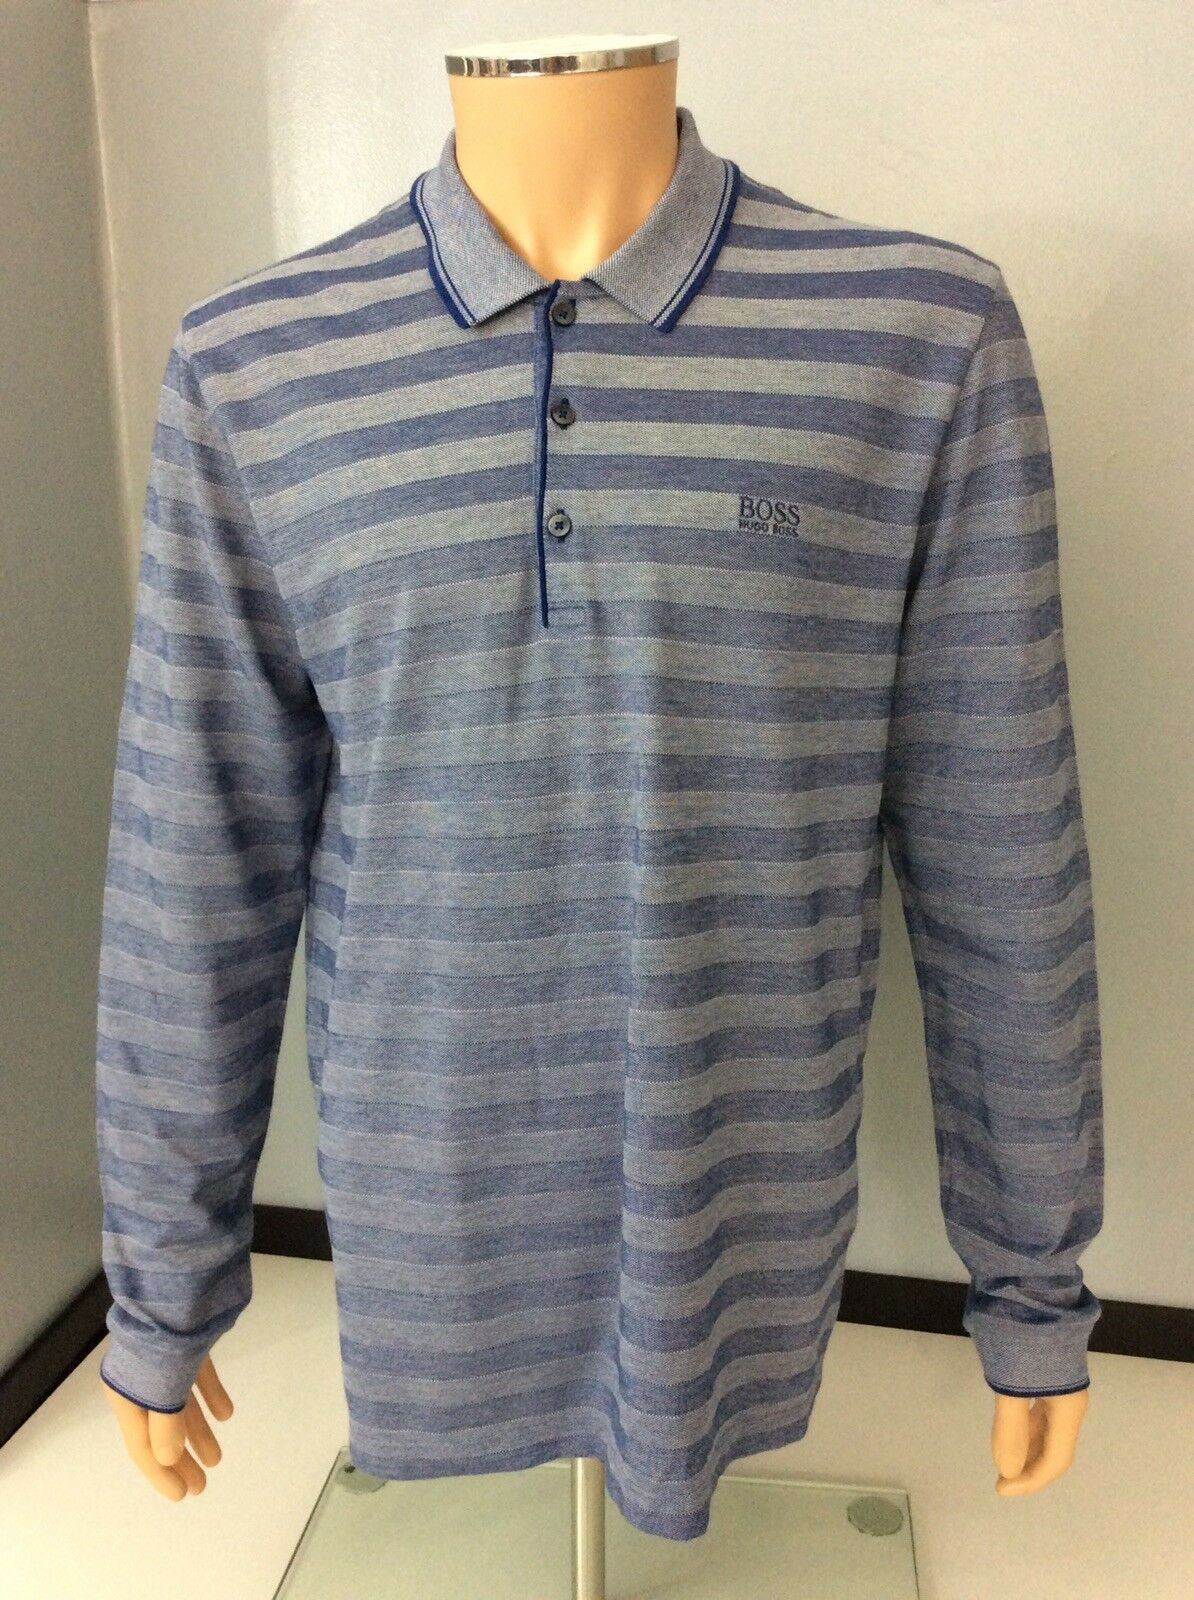 Hugo Boss Tivoll Mens Long Sleeve Polo T Shirt, Size XL, bluee, Vgc